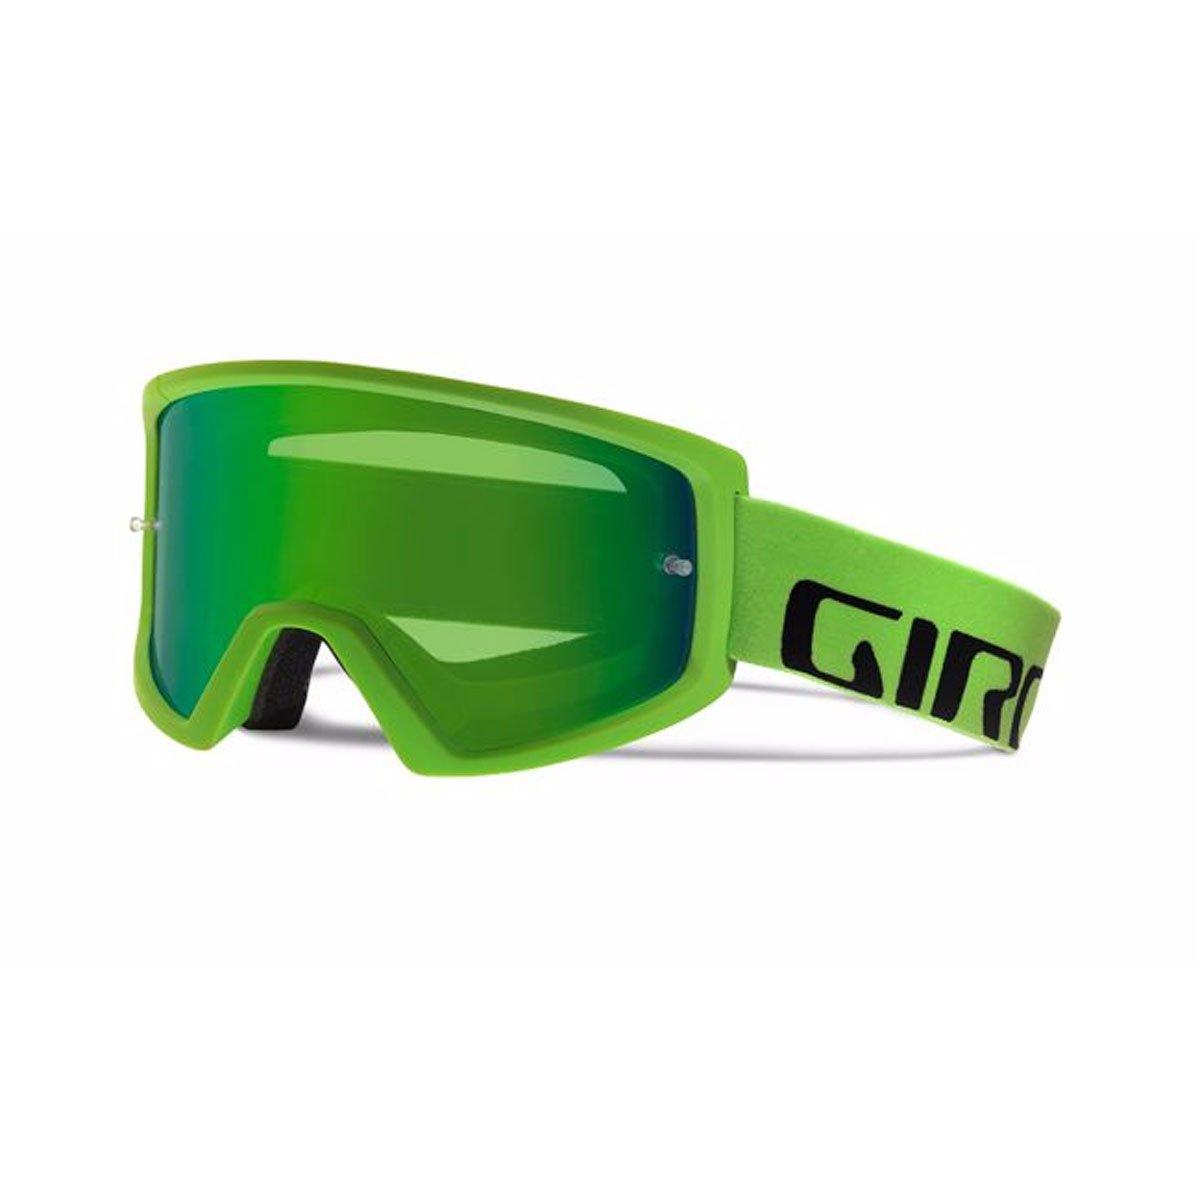 Giro Mtb Brille 2017 Blok Matt Lime-Grau Grun (One Größe , Grun)